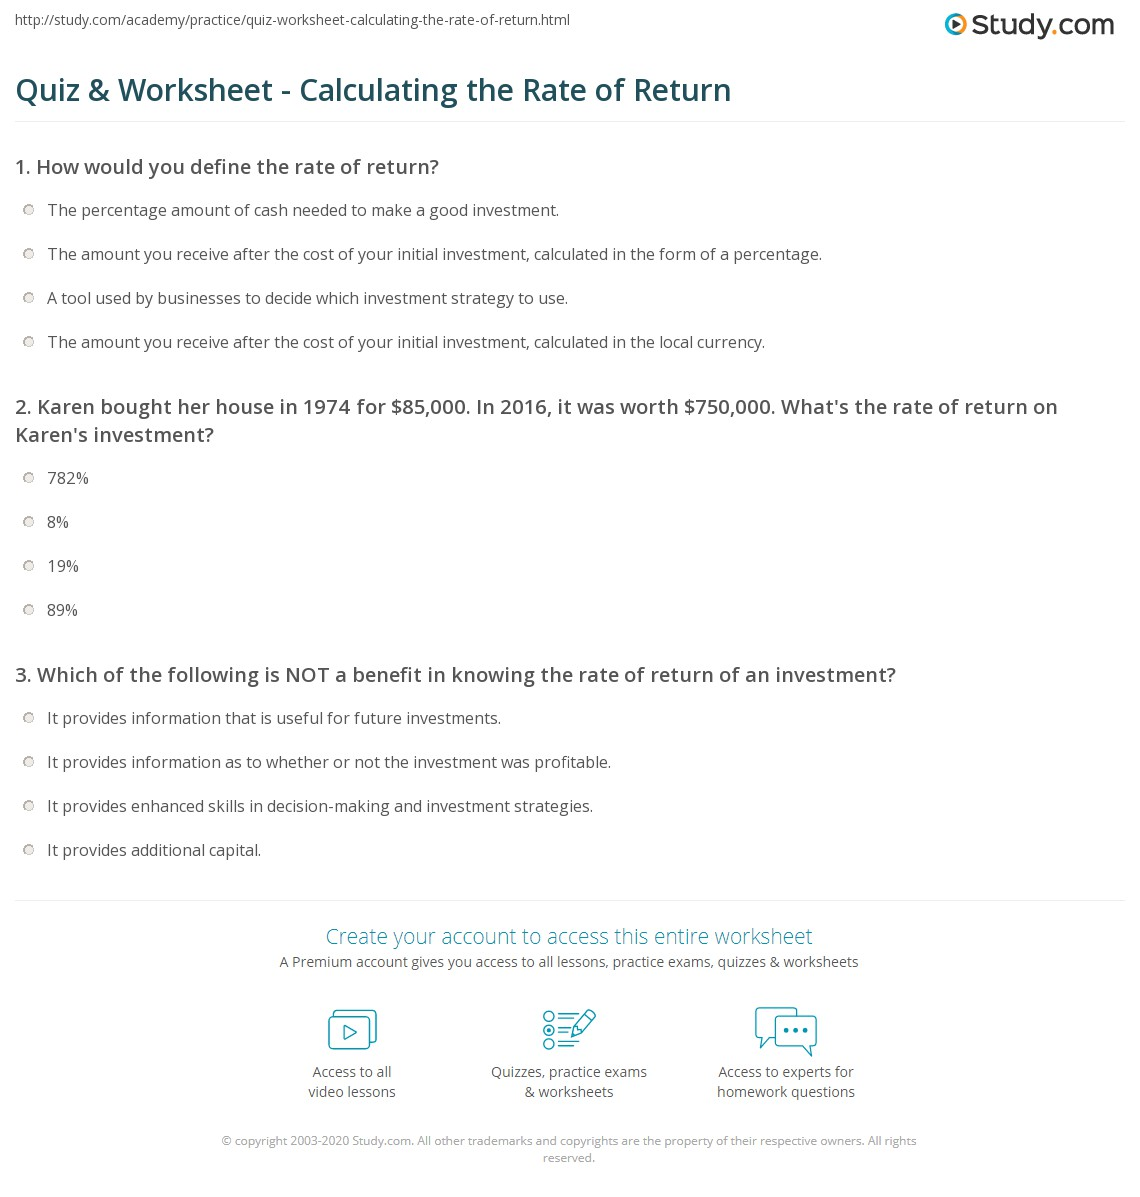 Quiz & Worksheet - Calculating the Rate of Return | Study.com